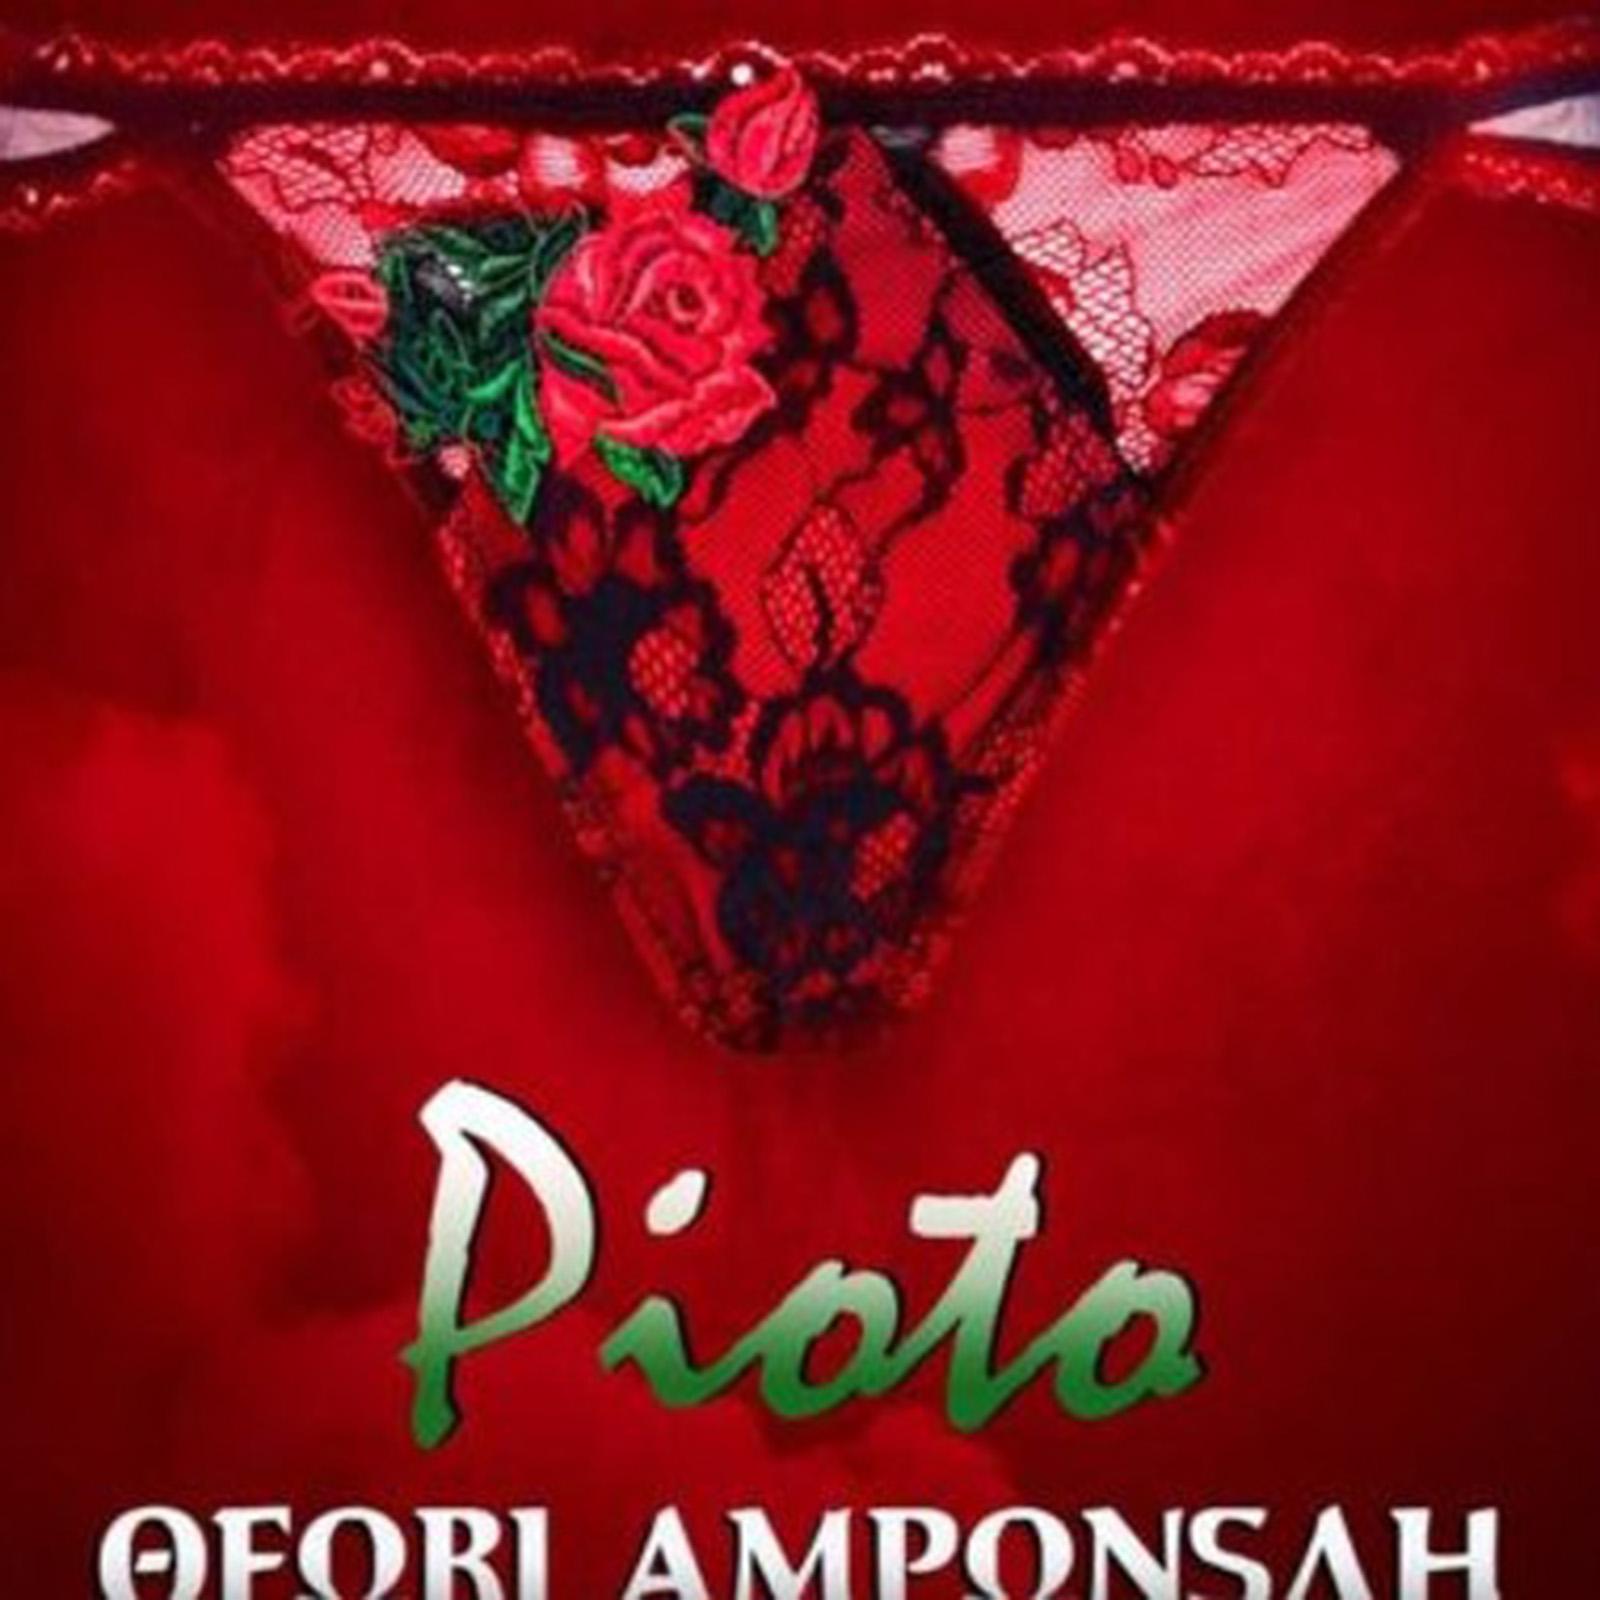 Pioto by Ofori Amponsah